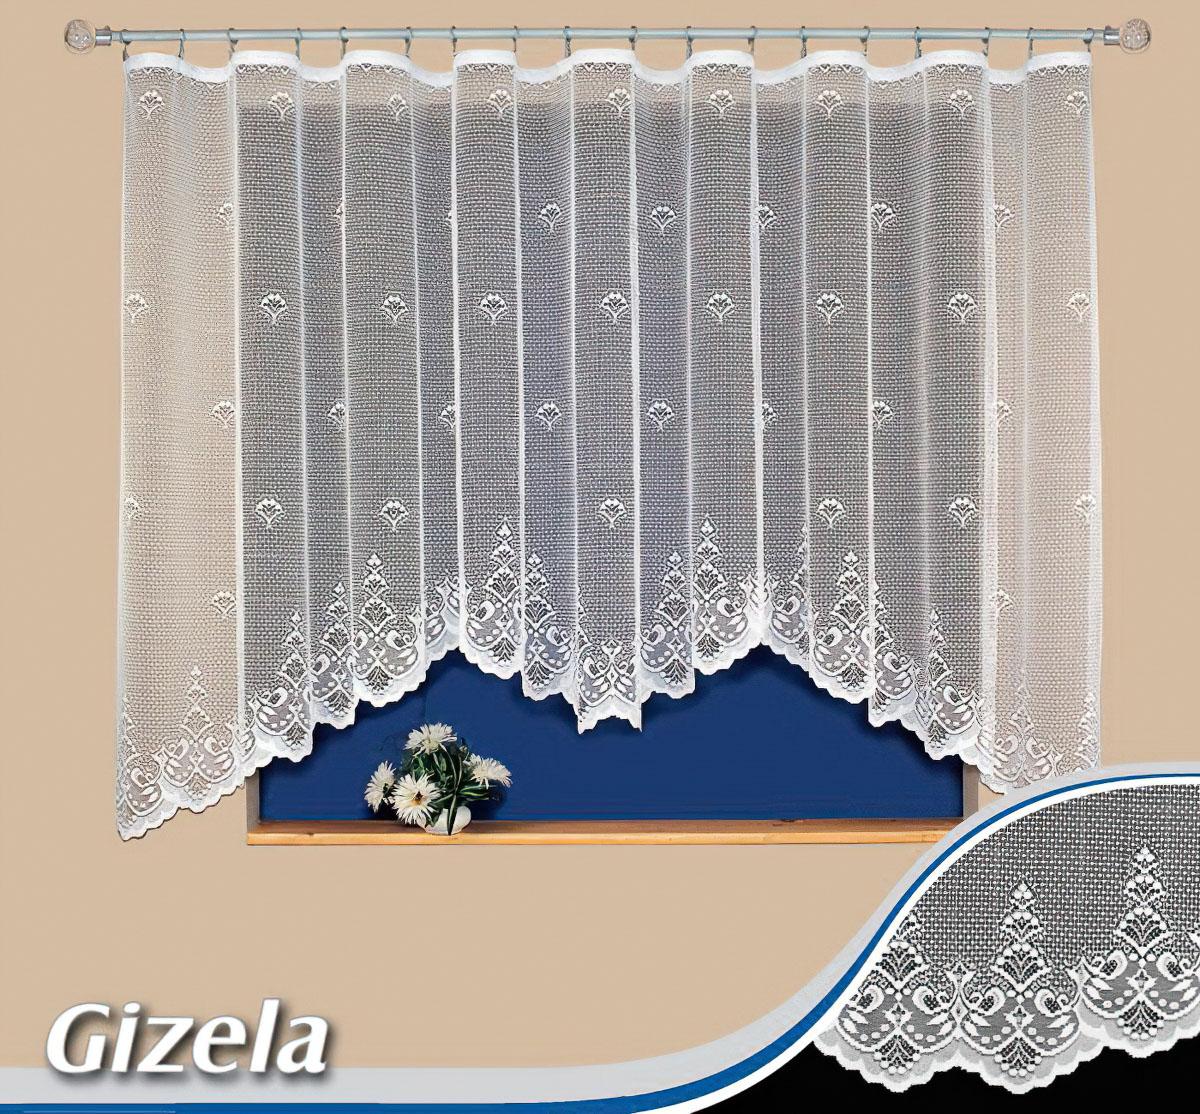 Tylex kusová záclona GIZELA jednobarevná bílá, výška 160 cm x šířka 350 cm (na okno)